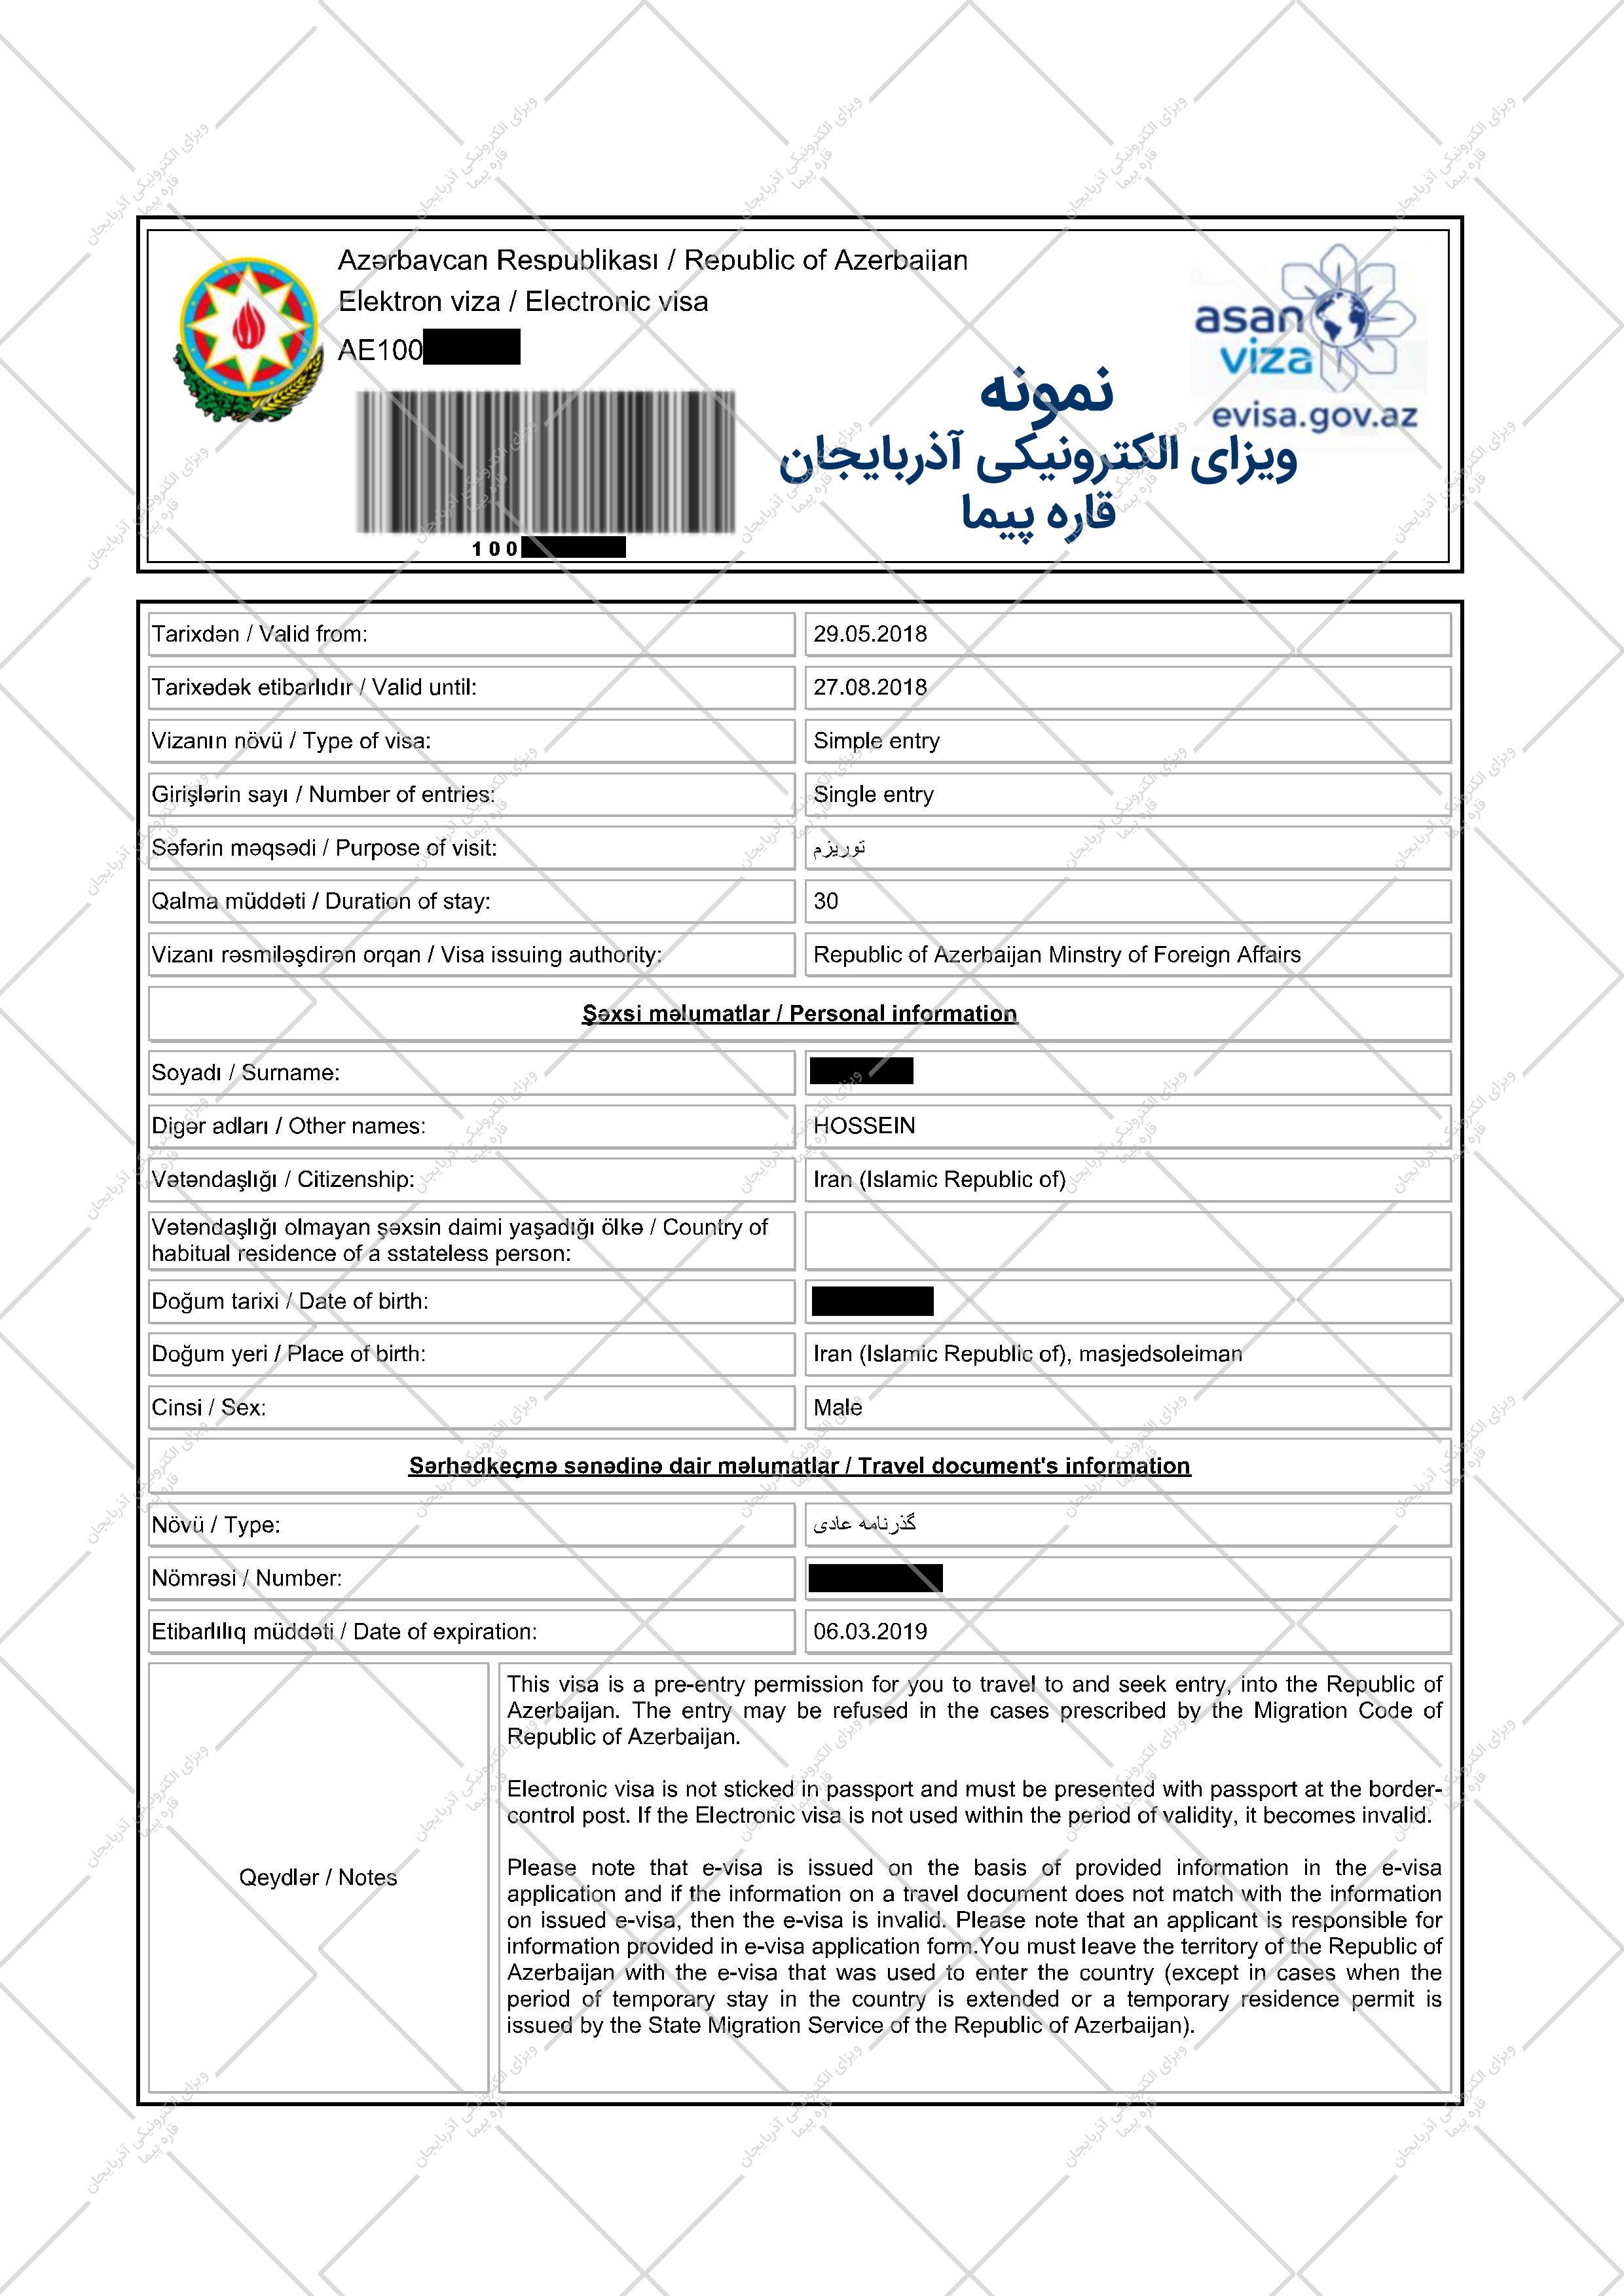 نرخ اخذ ویزا الکترونیک آذربایجان عادی و فوری تضمینی سال 1397 قاره پیما